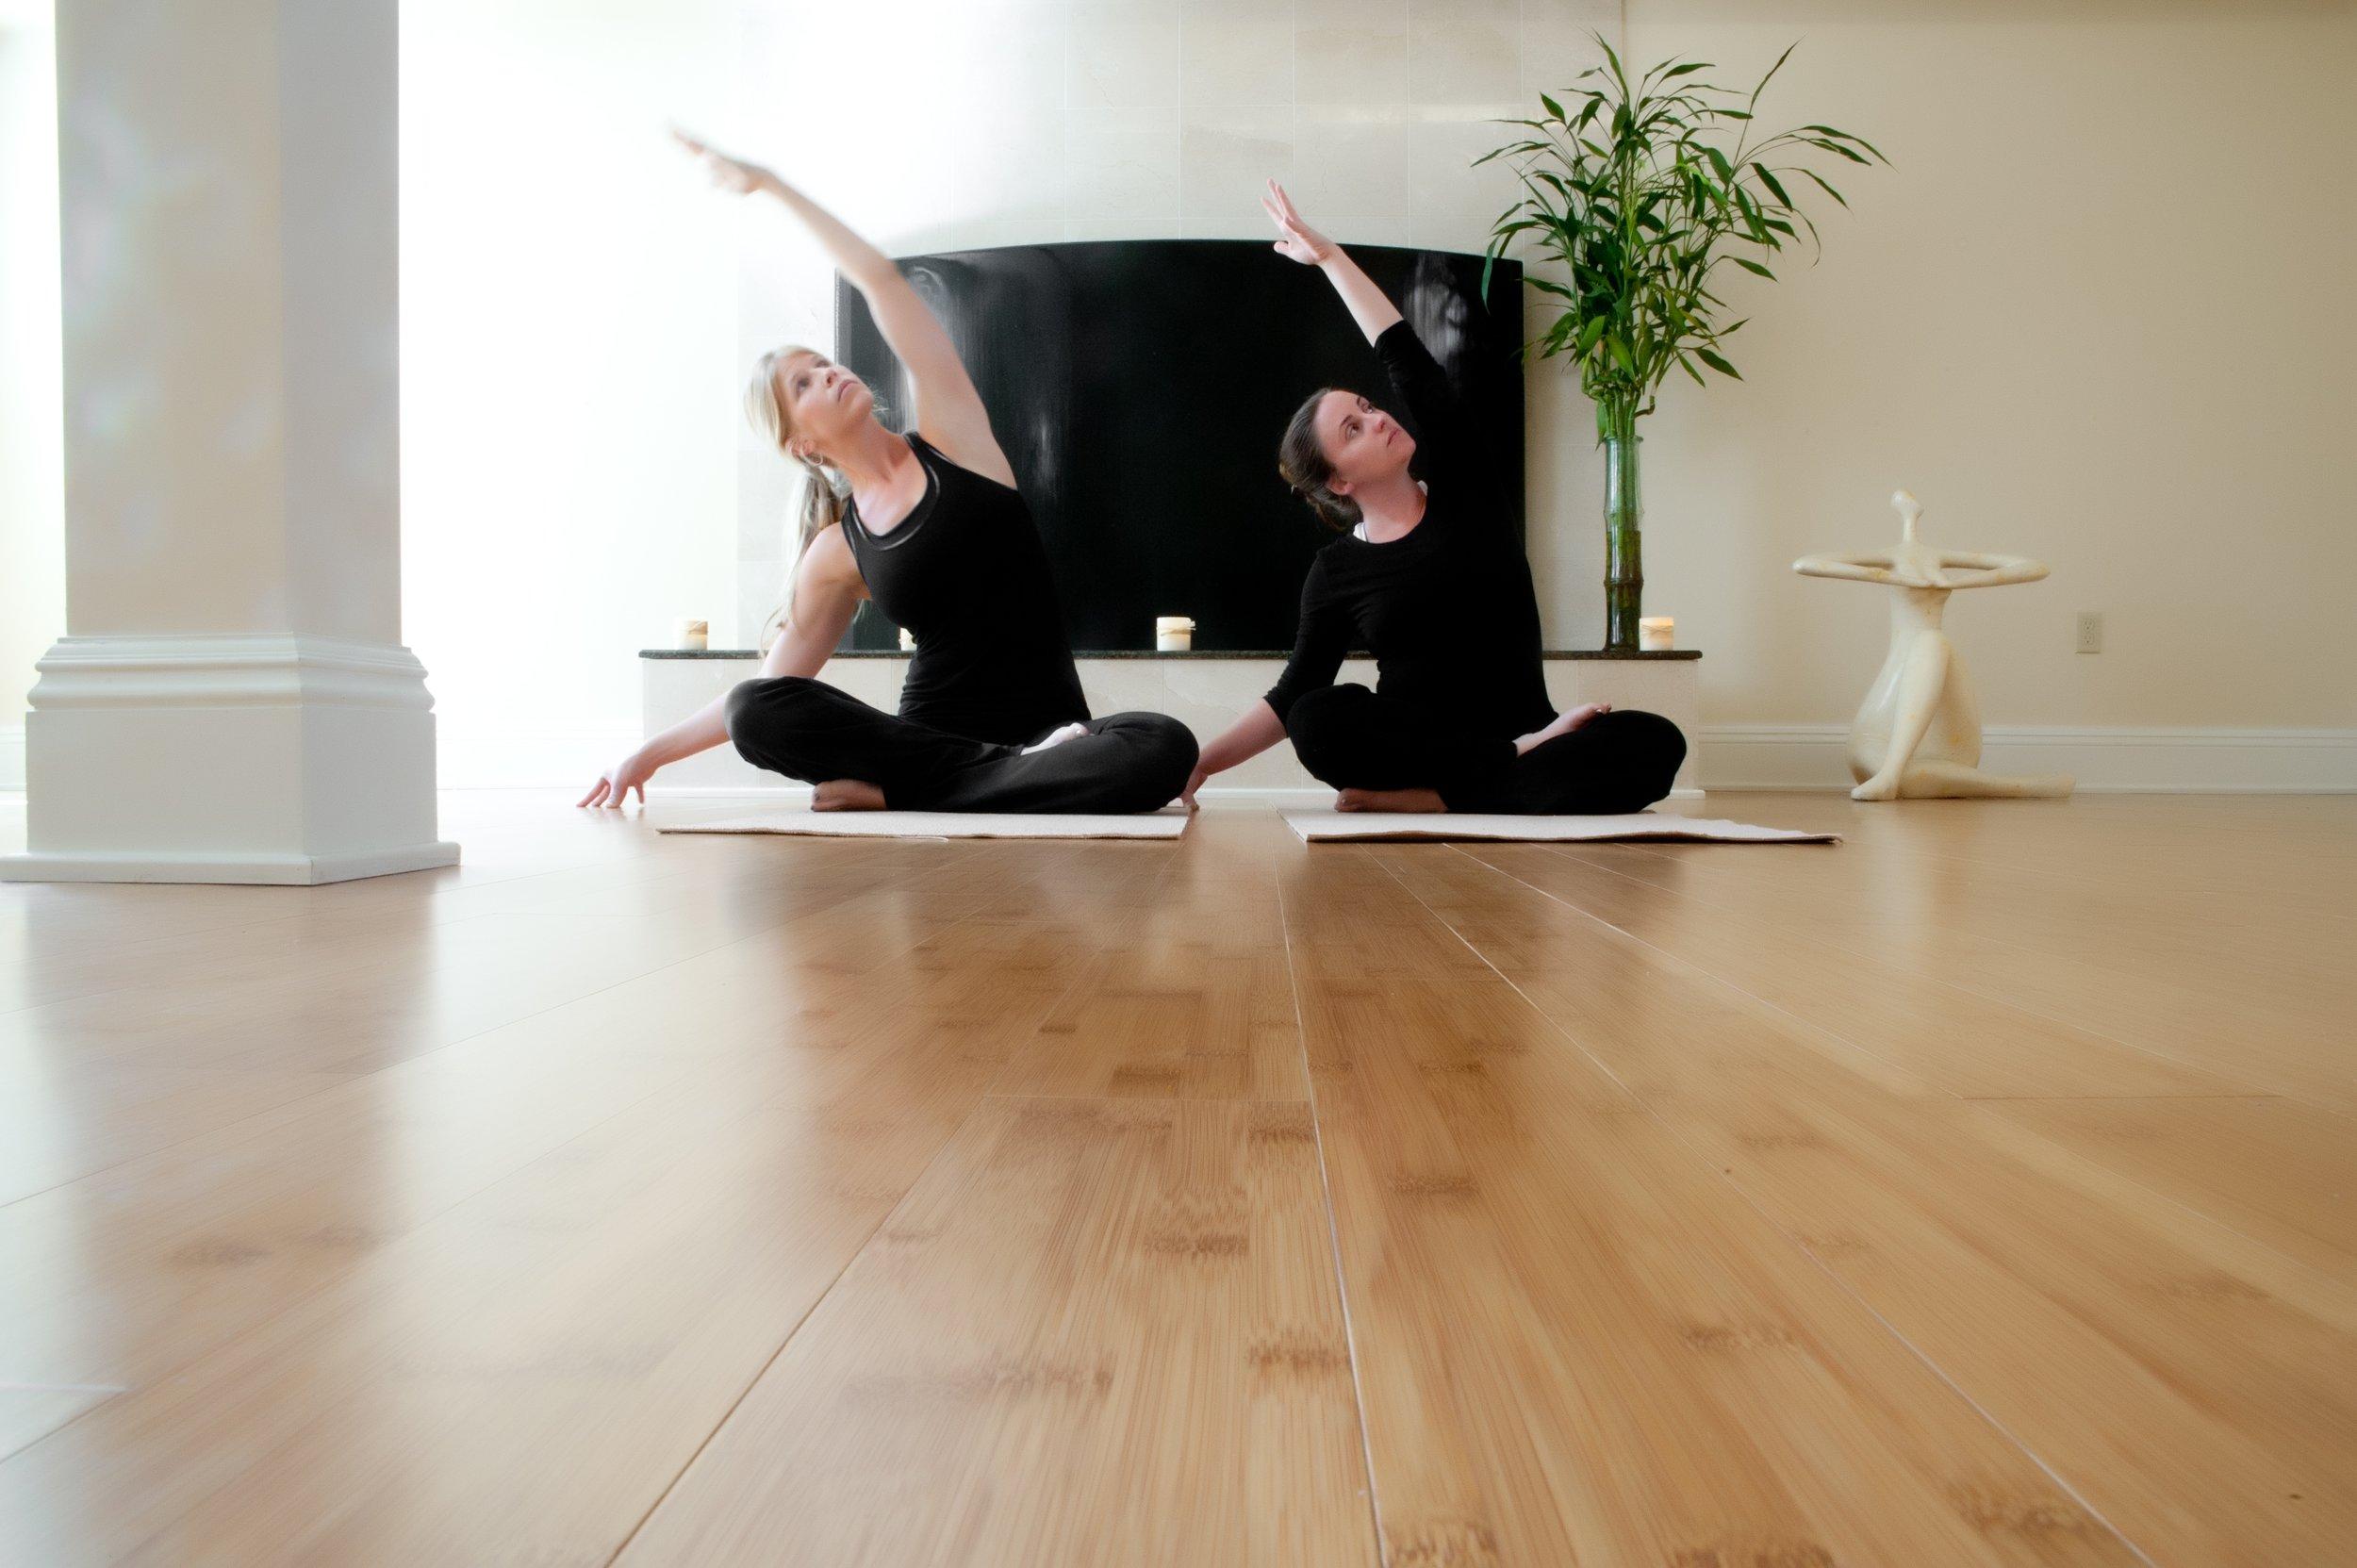 yoga pose4.JPG